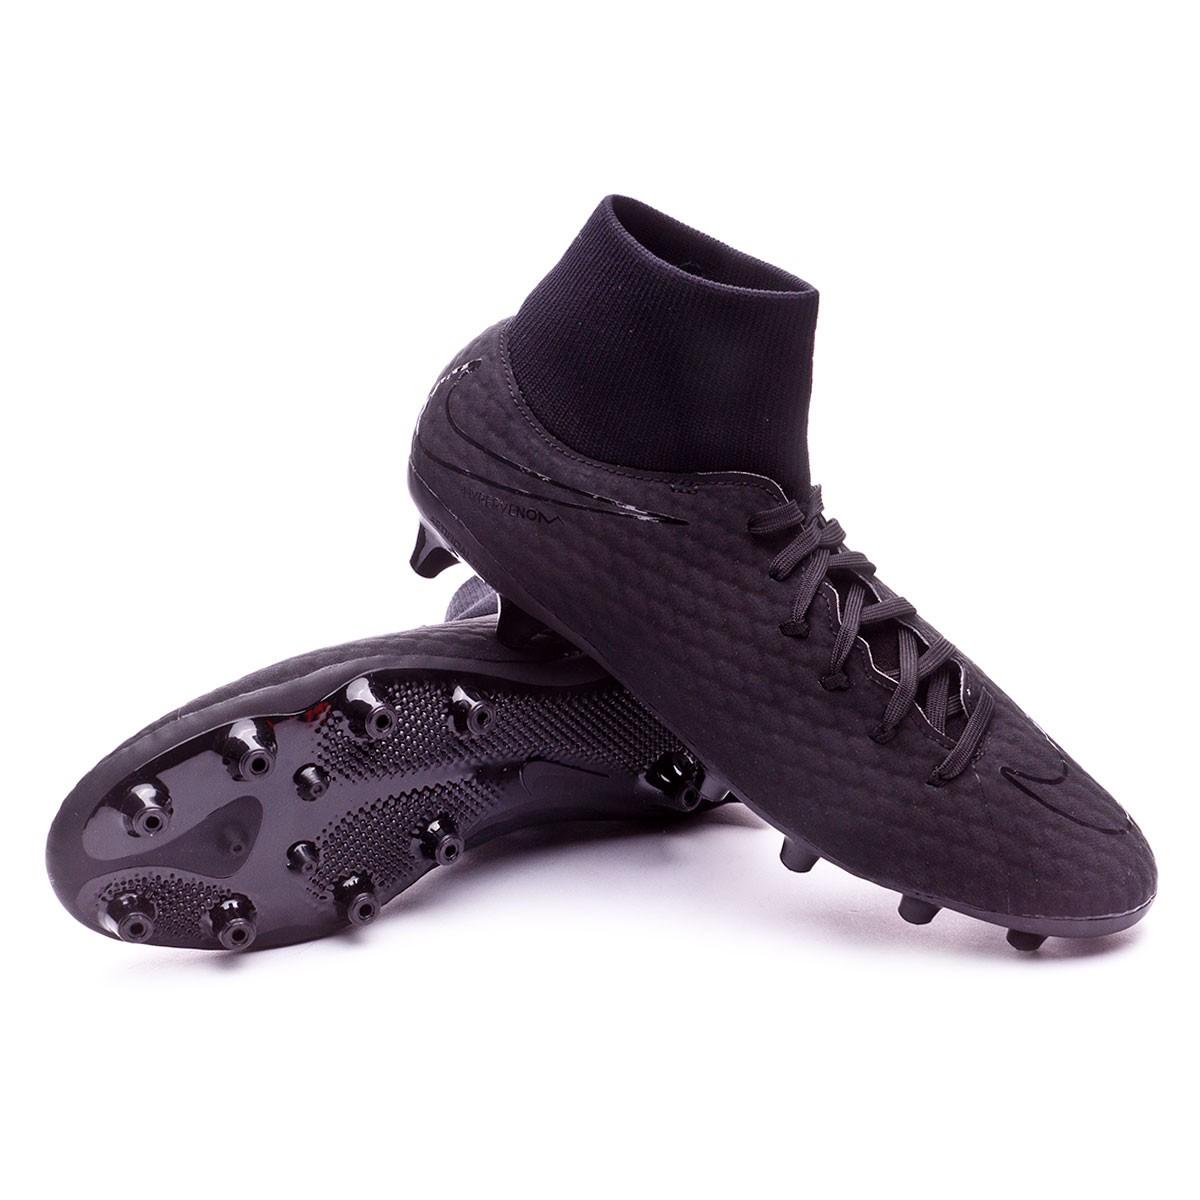 9e0456f7ef0 Football Boots Nike Hypervenom Phelon III DF AG-Pro Black - Football ...